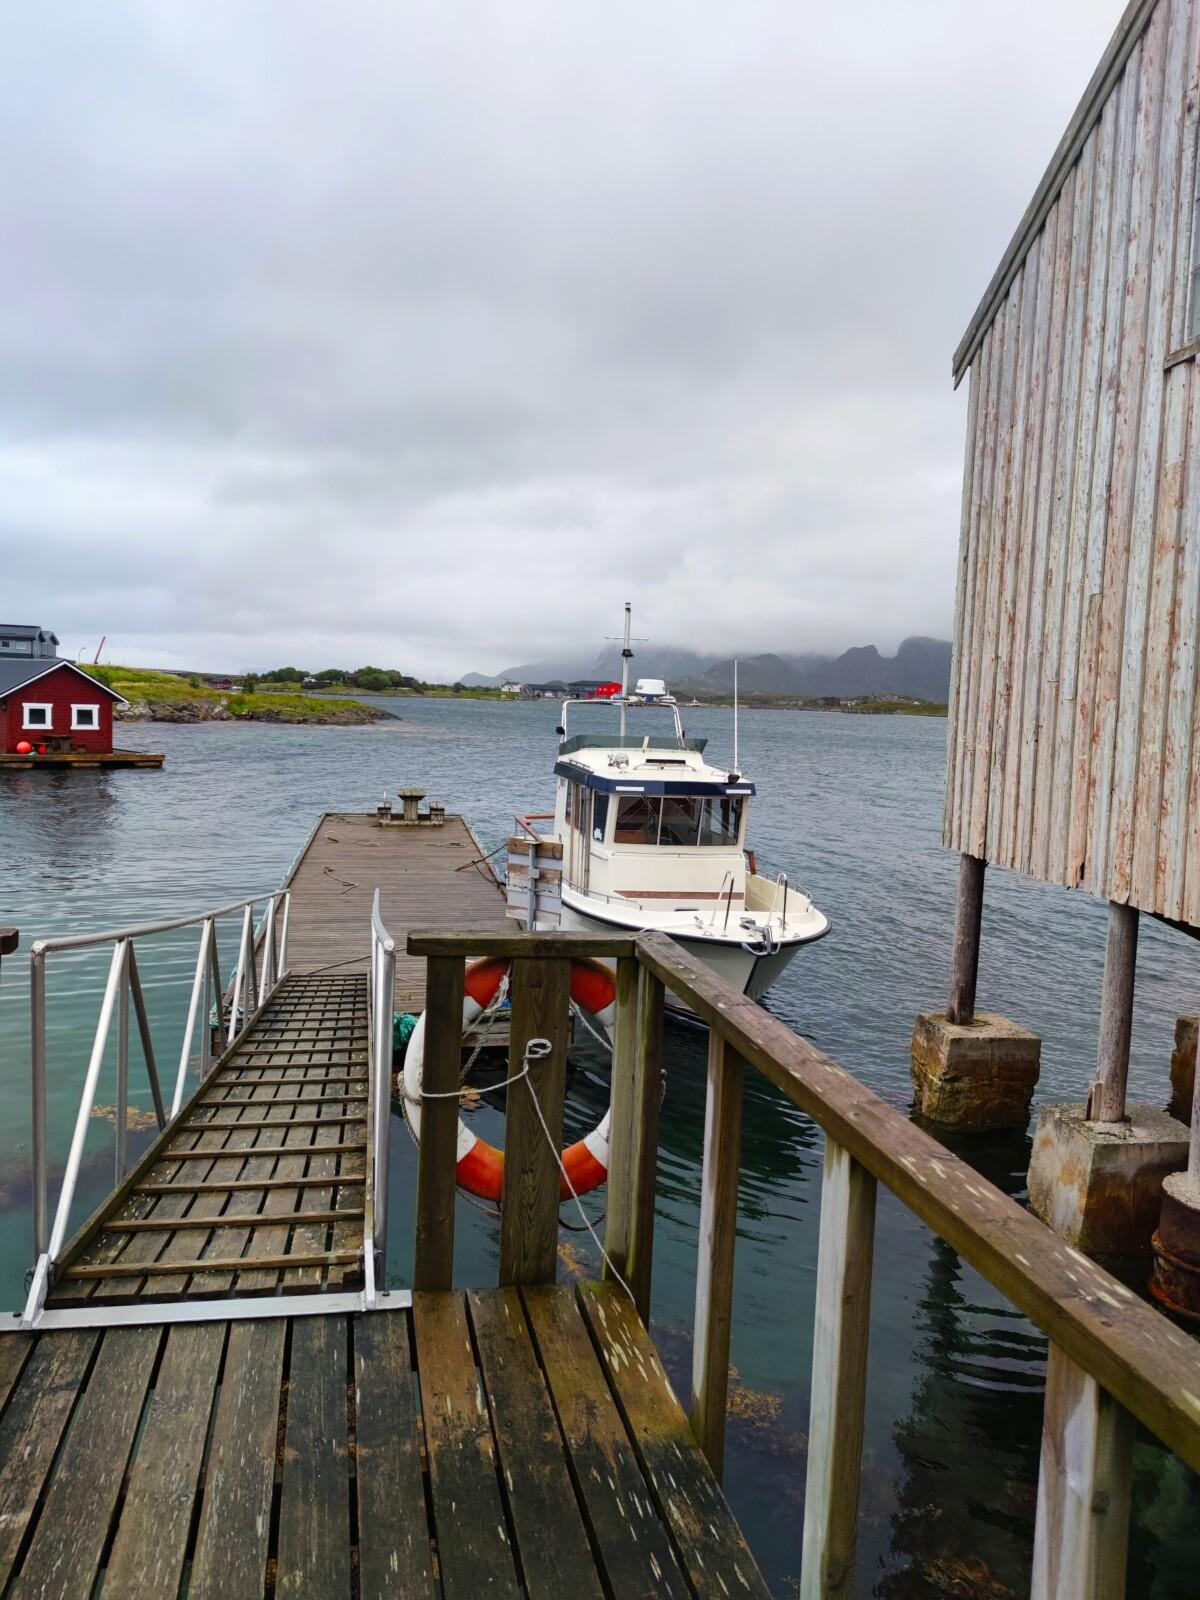 bildedryss-bilder-nordnorge-nord-norge-seløy-seløya-helgeland-herøy-sandnessjøen-mosjøen-natur-norge-norway-northofnorway-trondheim-vakkernatur-isalicious-klartvann-strang-norgesommer-norgessommer-sommer-helgelandskysten-isalicious.blogg.no-fisk-augustbryggo-restaurant-